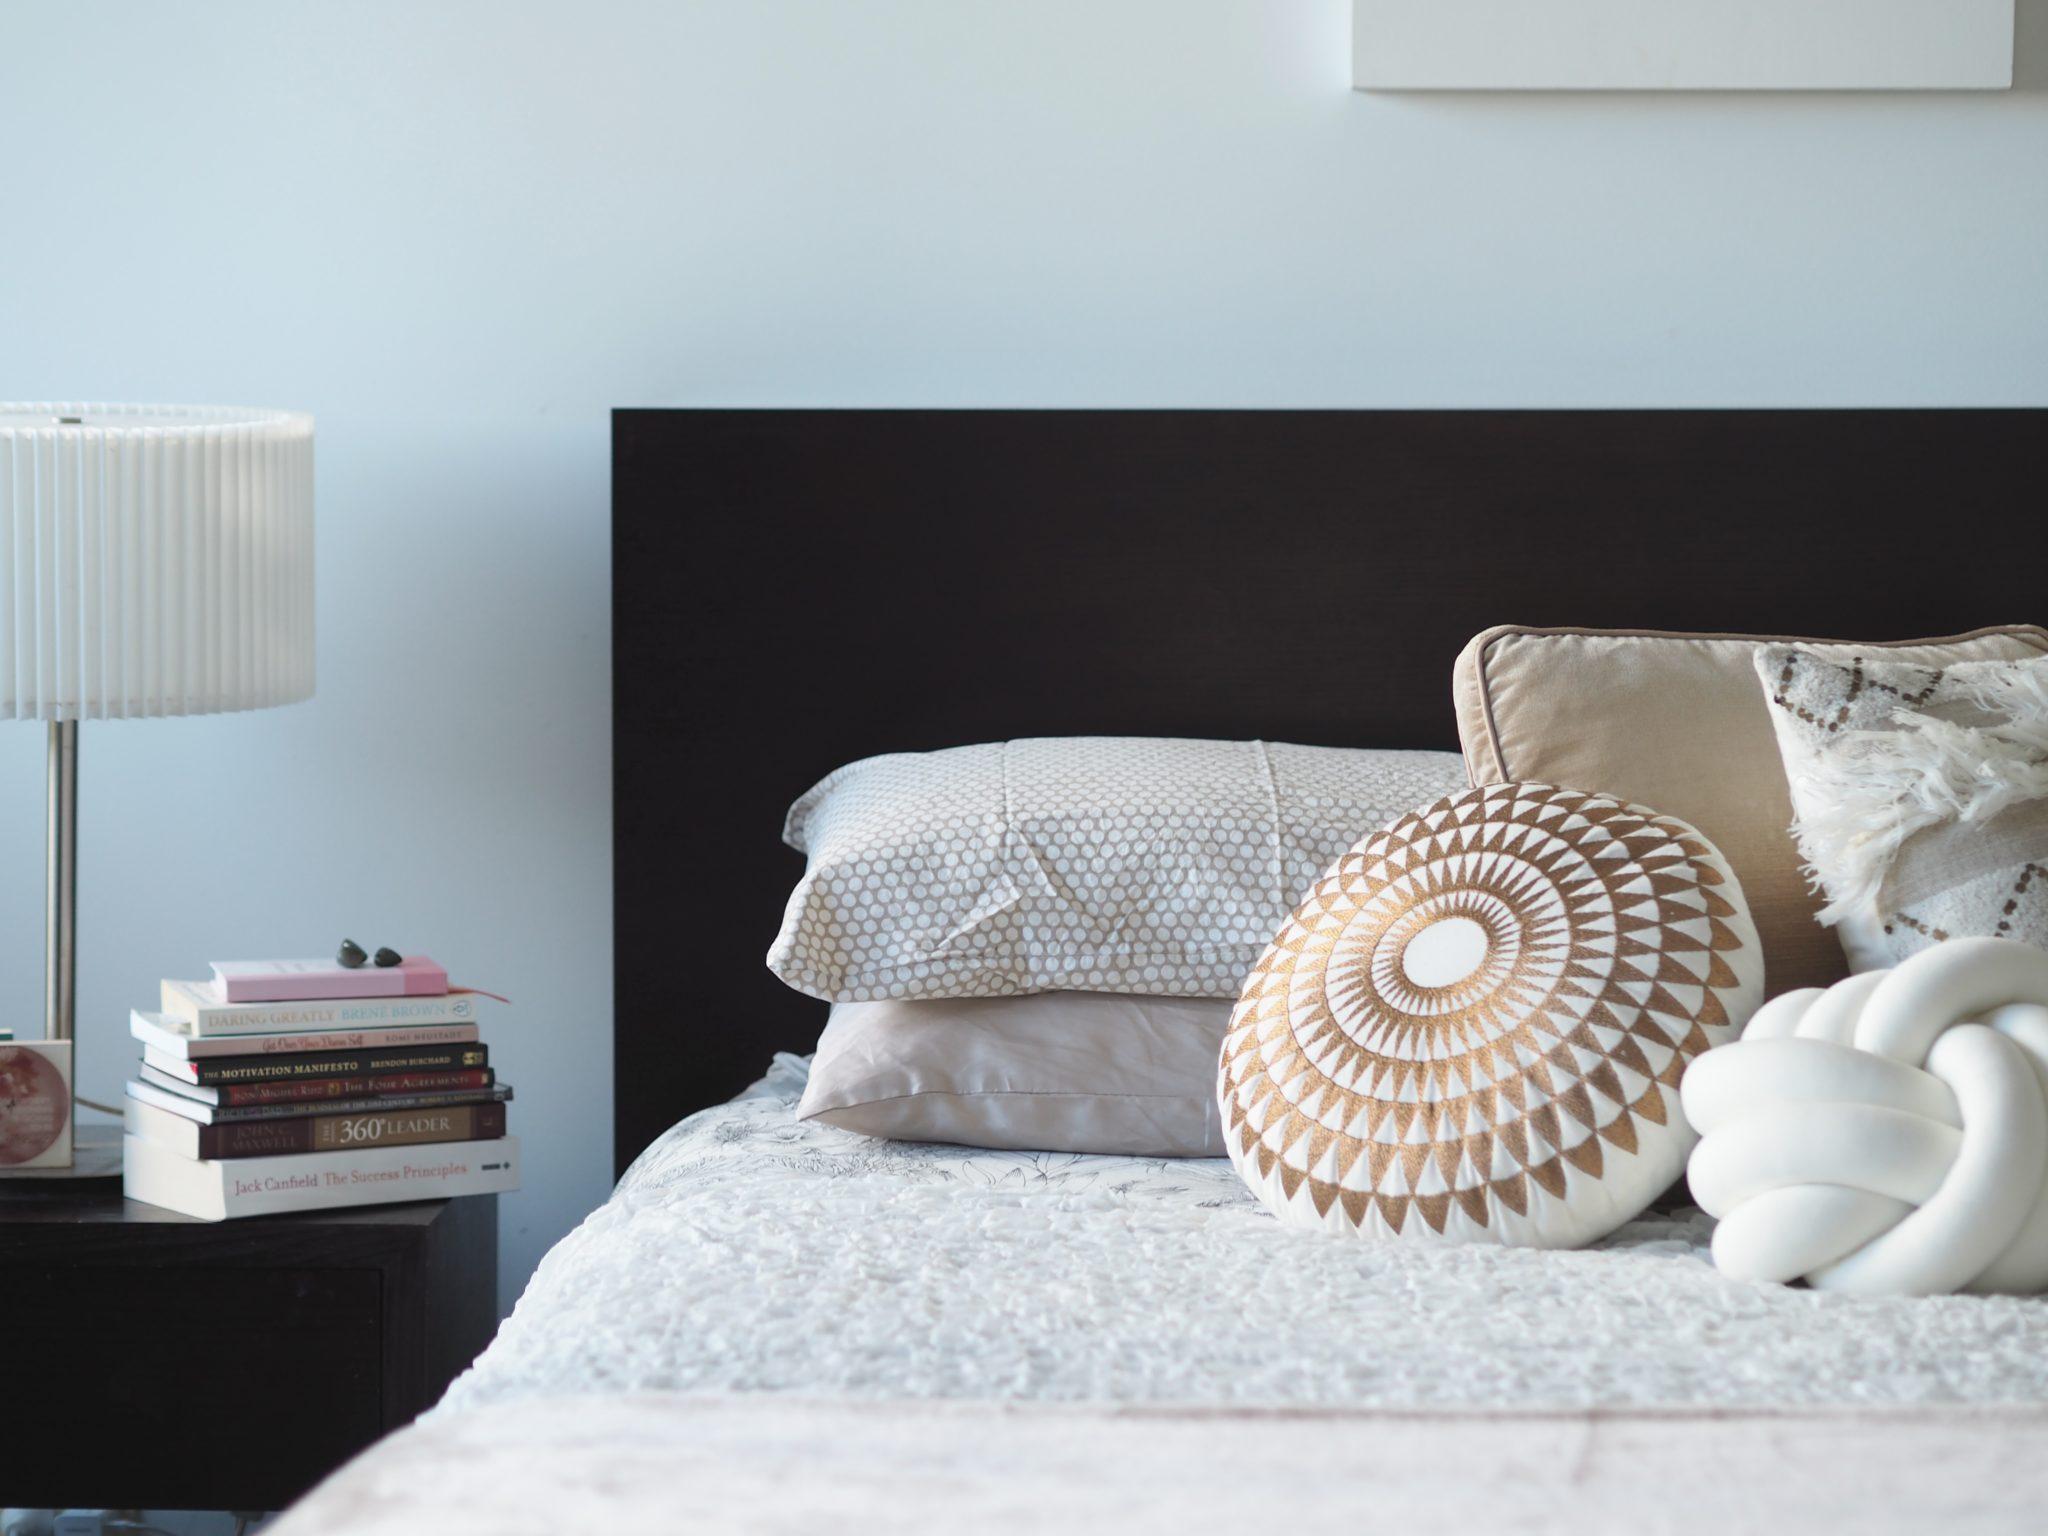 furnished apartment decorating cushions